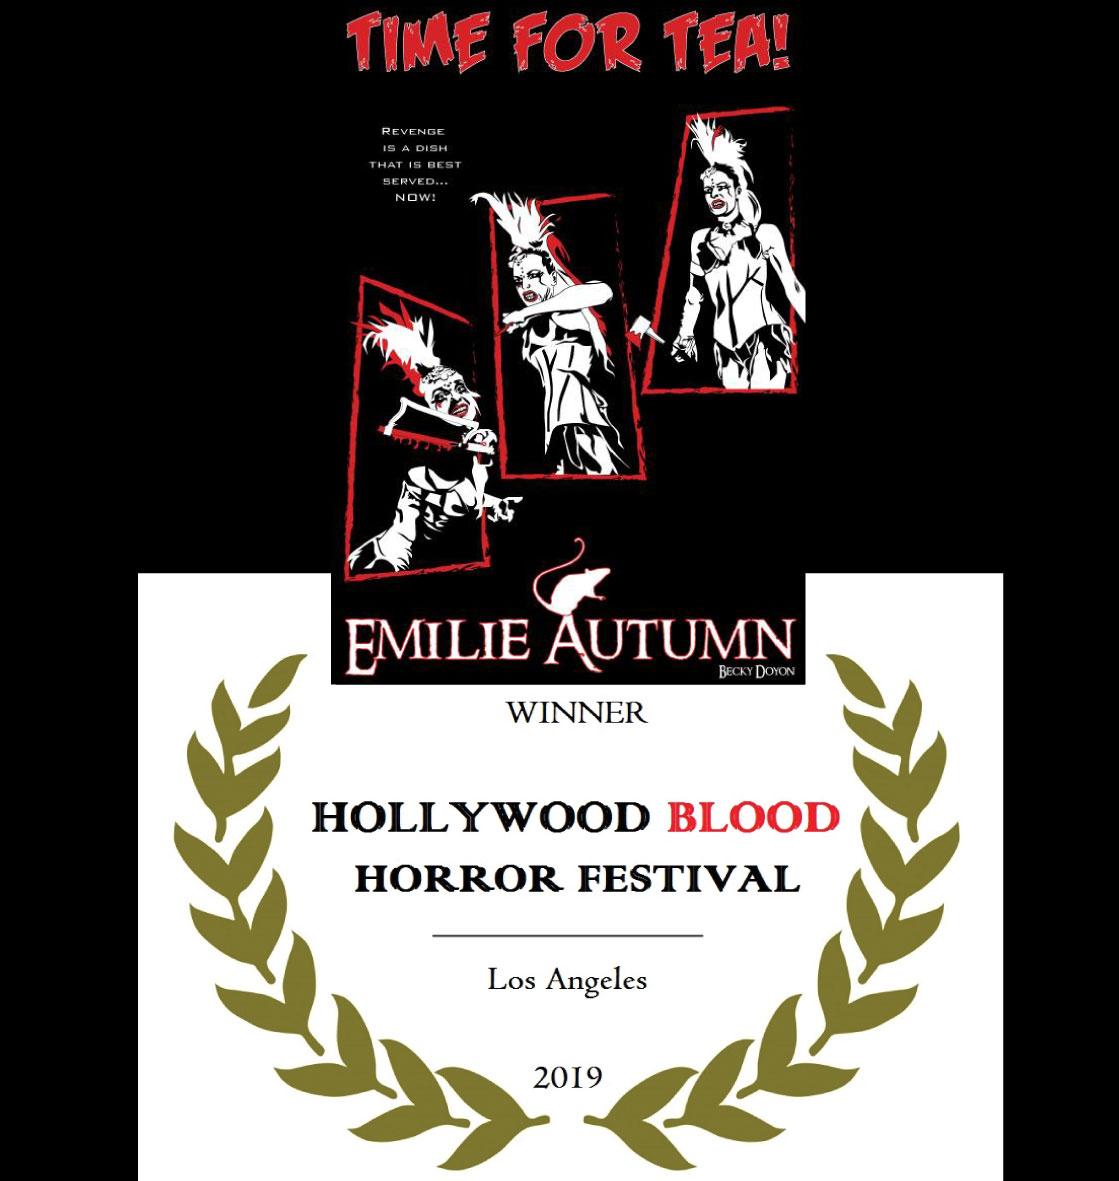 """Time For Tea"" won Best Poster for November at the Hollywood Blood Horror Festival!   https://beckydoyon.com/blogs/news/time-for-tea-won-at-the-hollywood-blood-horror-festival…  #horrorartist #horrorcommunity #horrorfamily #horrorfam #maineartistpic.twitter.com/GgXtv3YQxY"